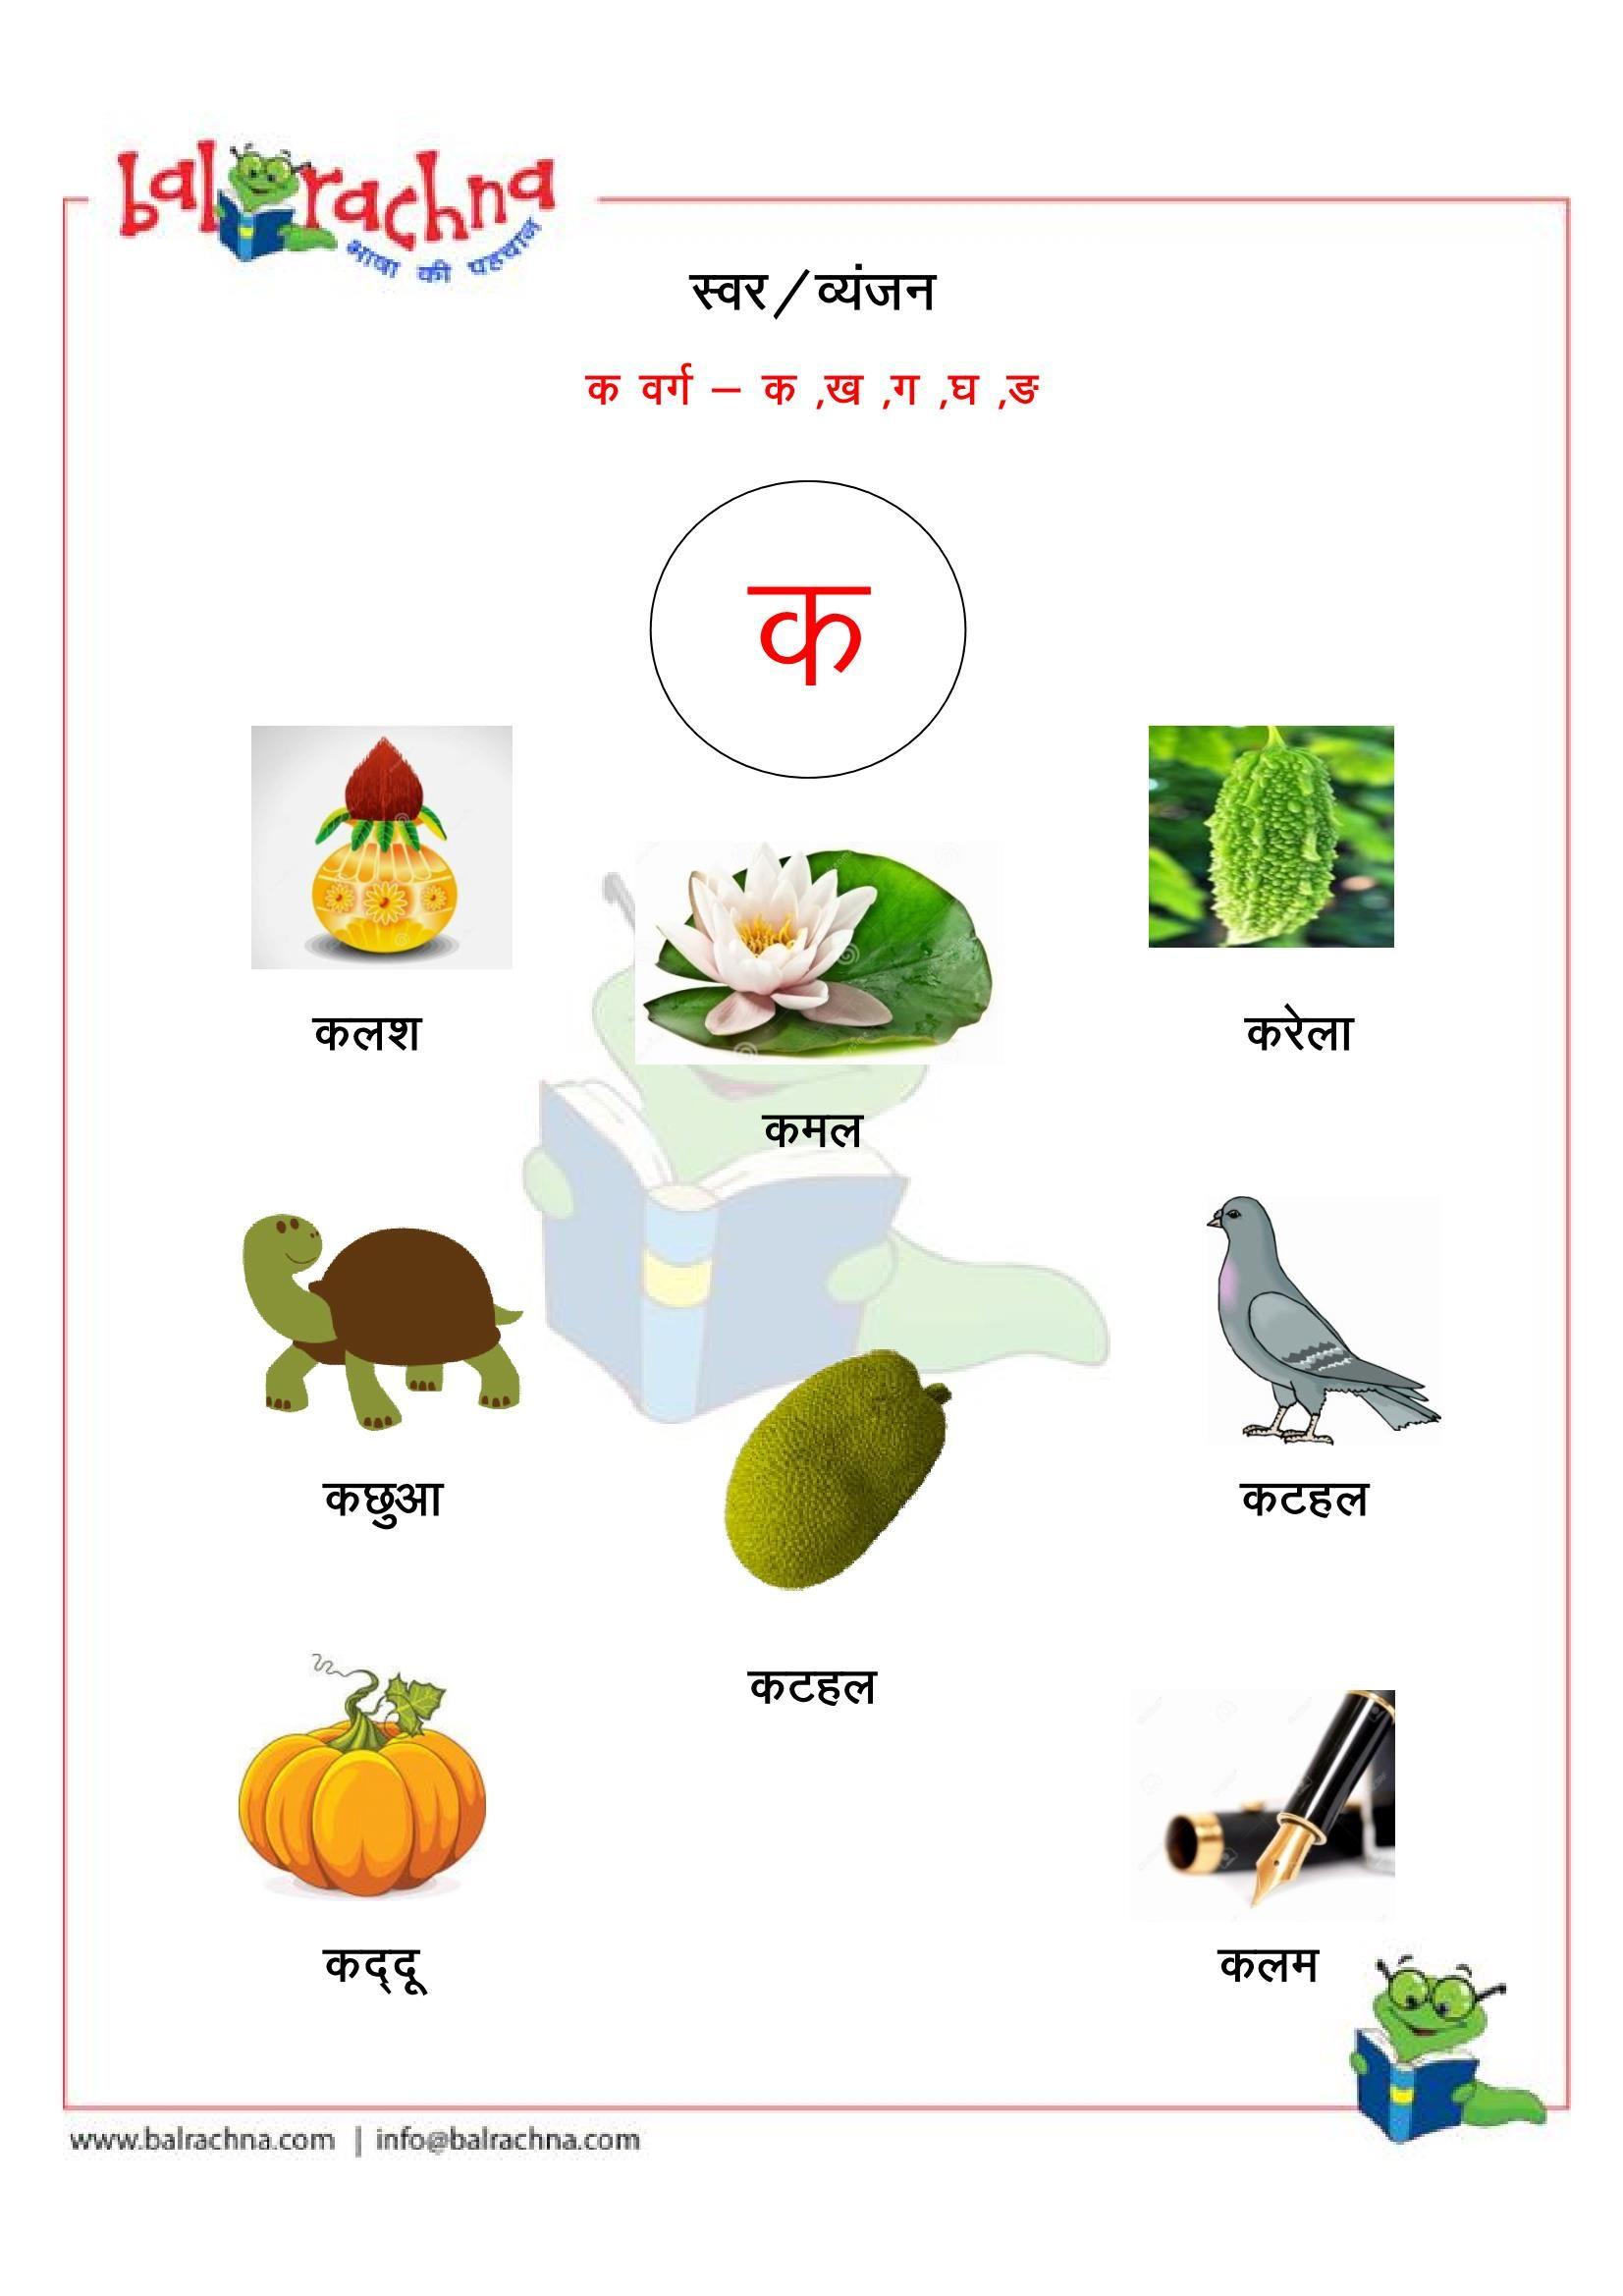 Pin By Sreedevi P On Hindi Hindi Language Learning Hindi Worksheets Hindi Alphabet [ 2338 x 1653 Pixel ]